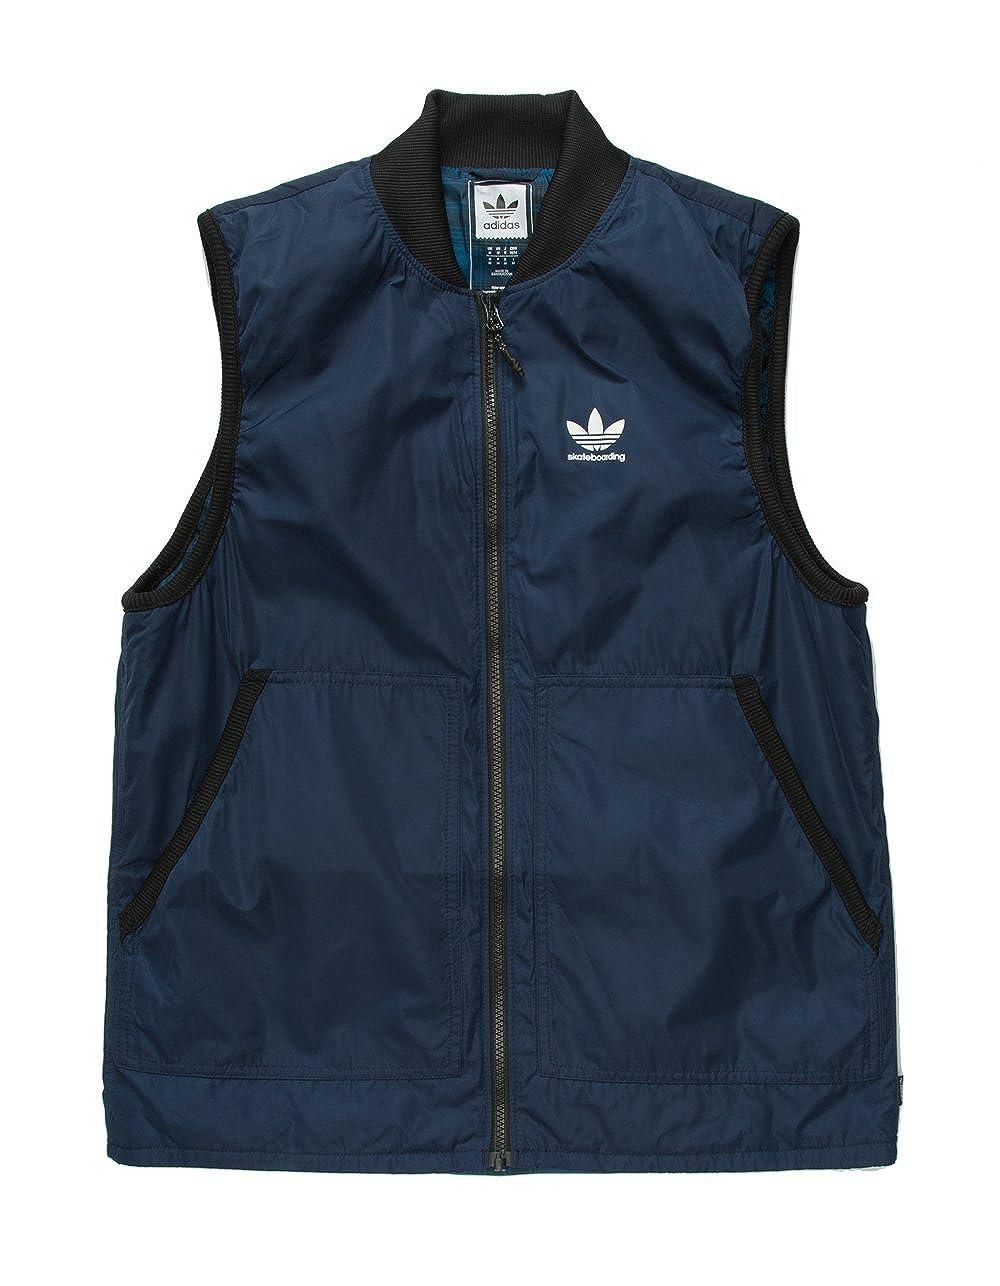 774b0fd813 adidas Skateboarding Men's Meade Light Vest at Amazon Men's Clothing ...